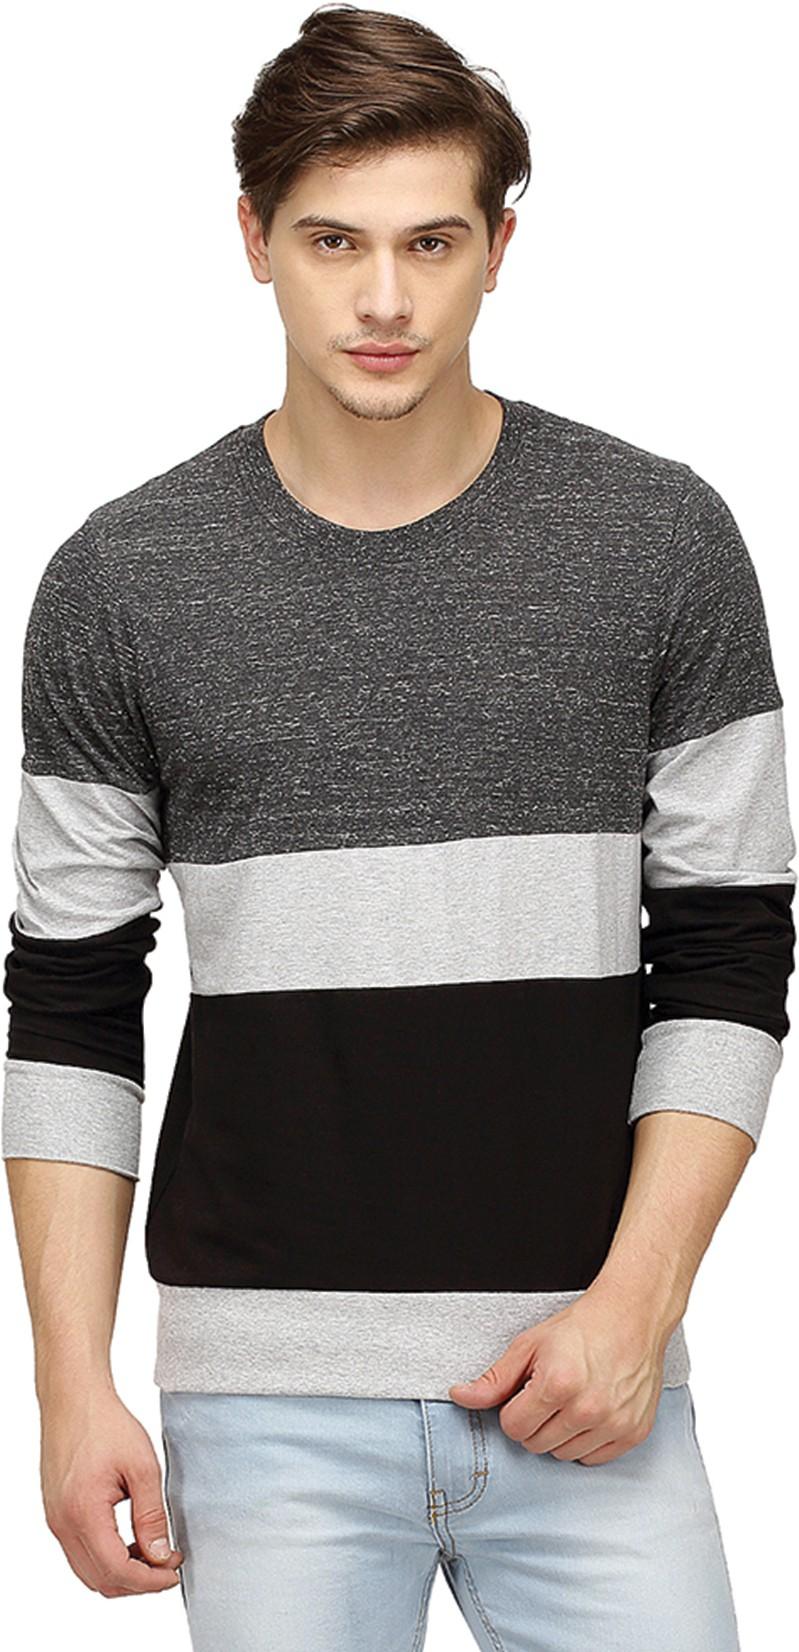 Flipkart - T-Shirts, Shirts... Duke, Campus Sutra...